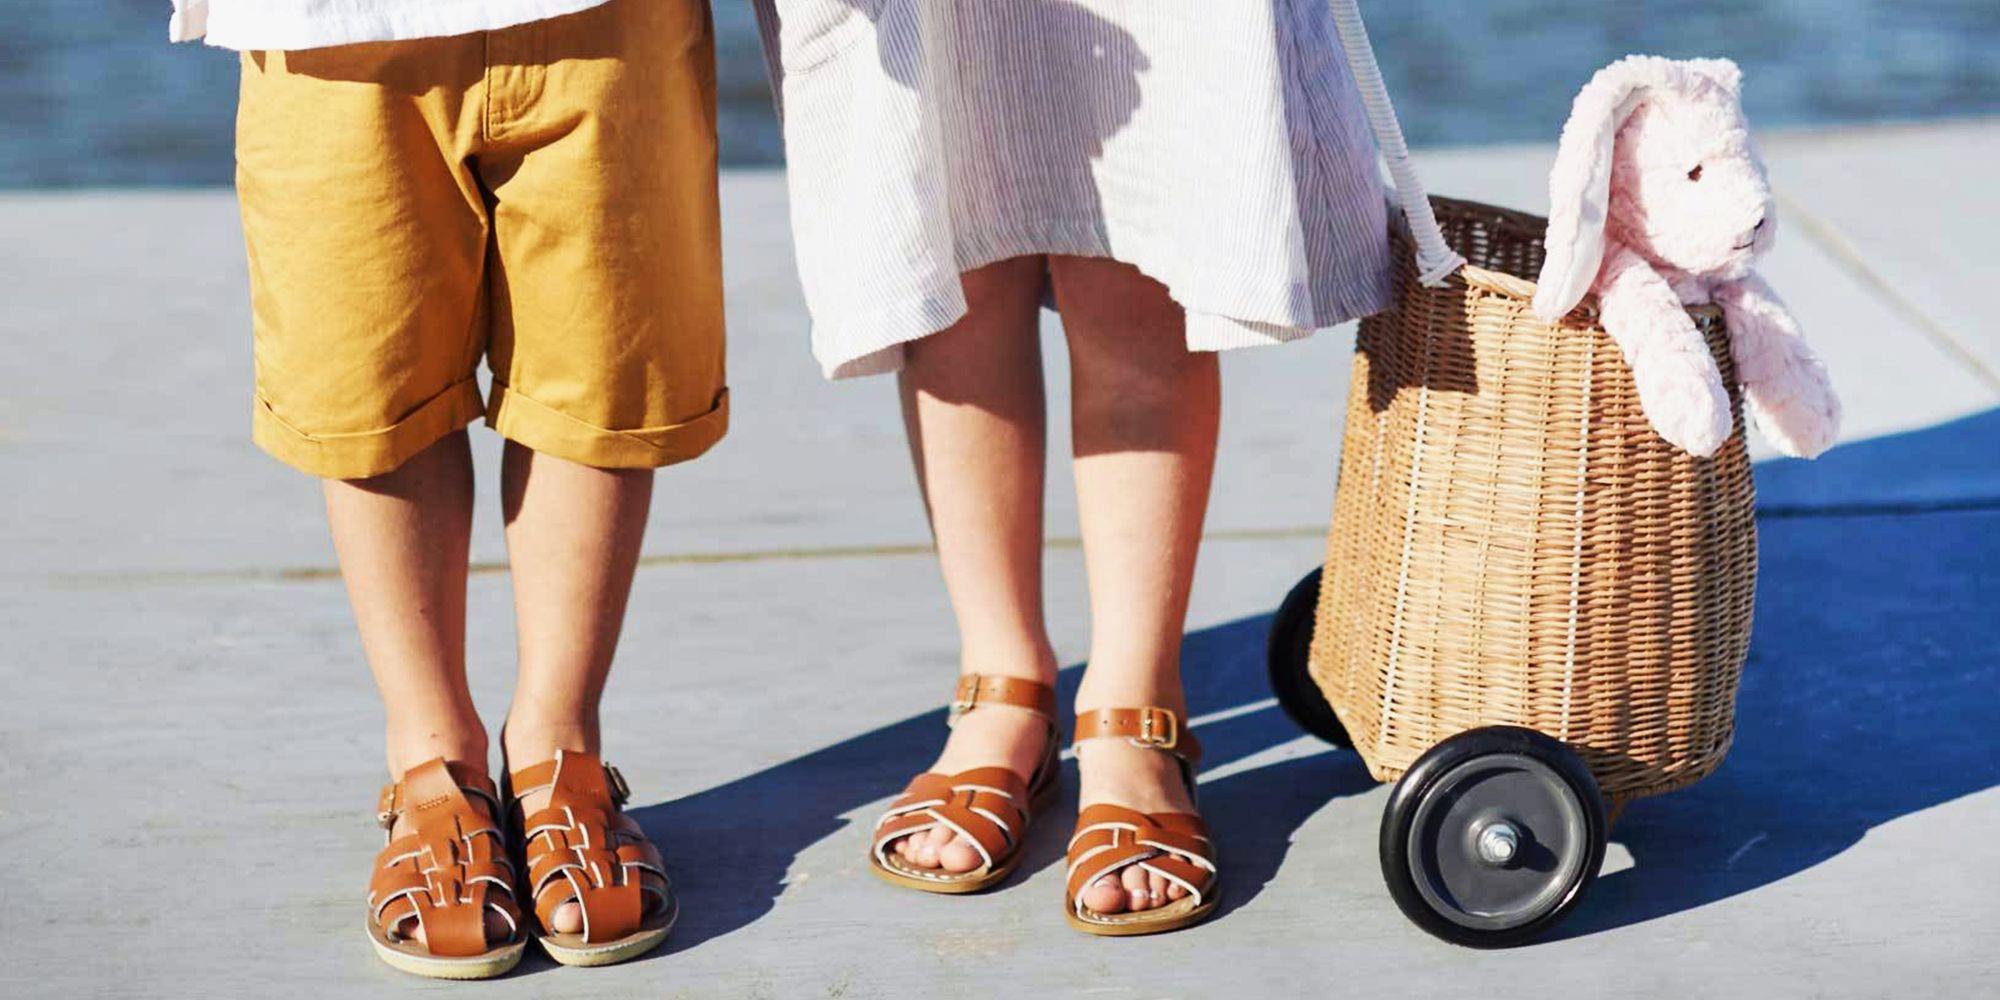 12 Best Kids Sandals for Boys \u0026 Girls